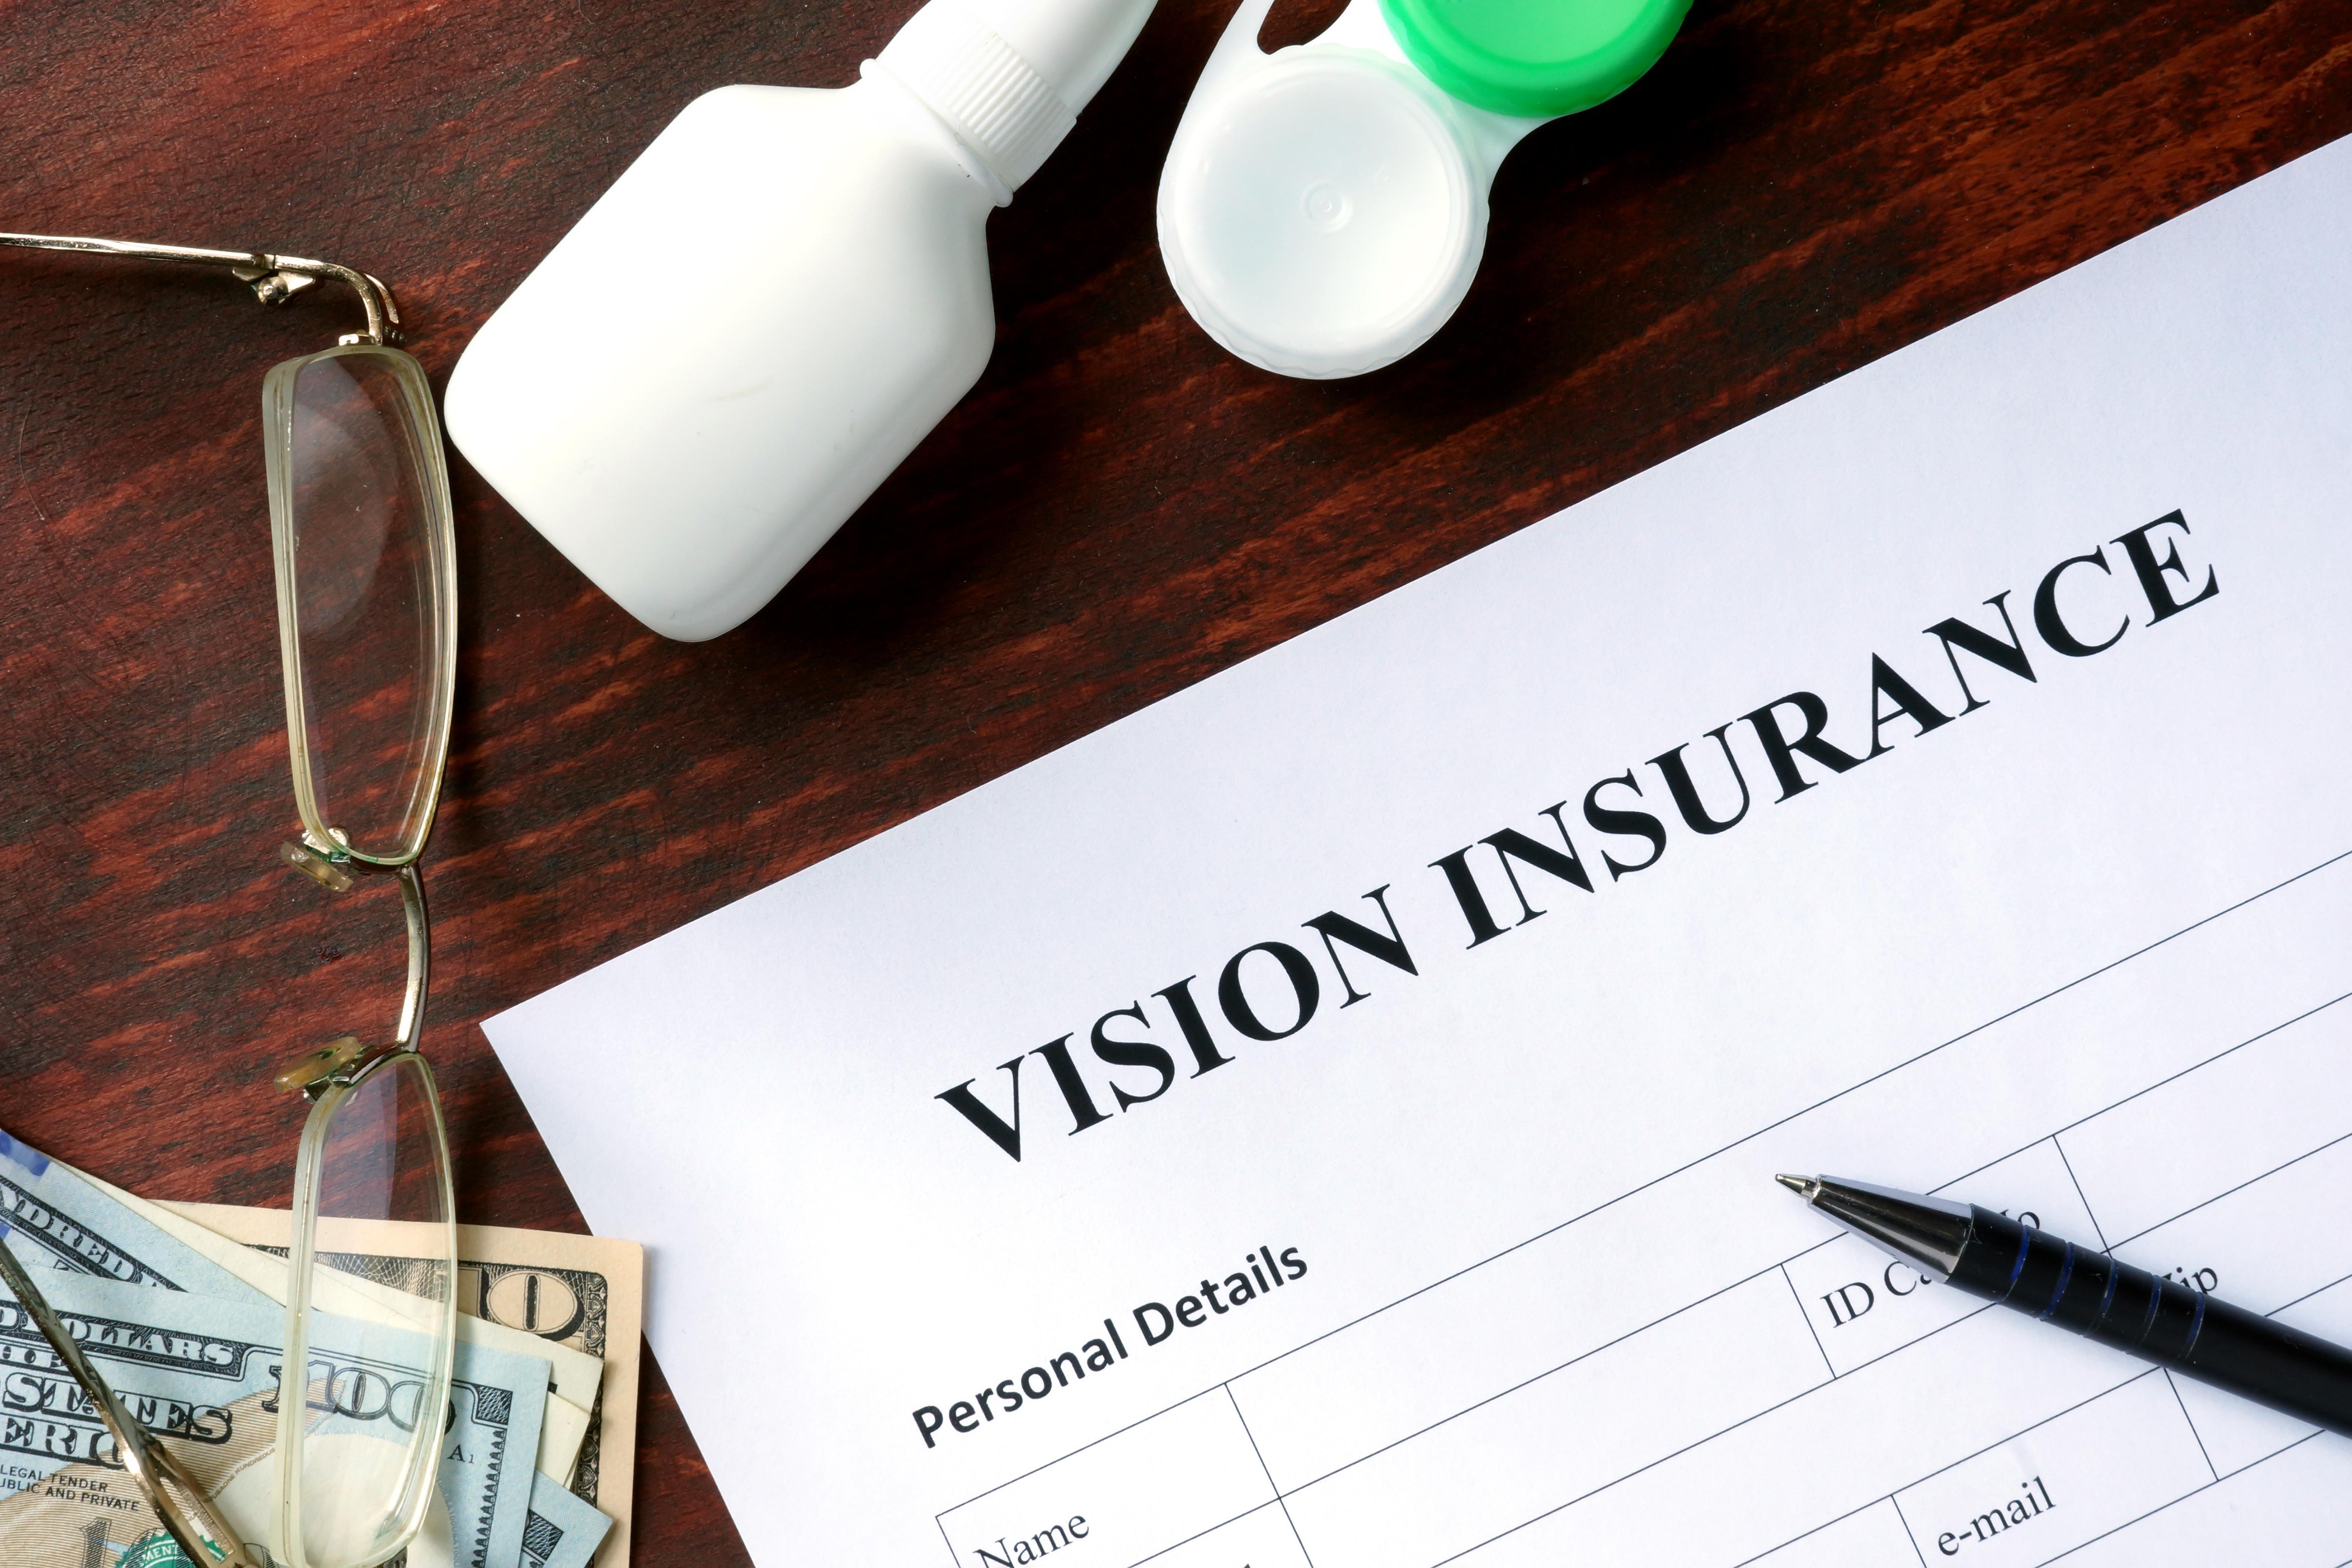 Vision insurance paperwork